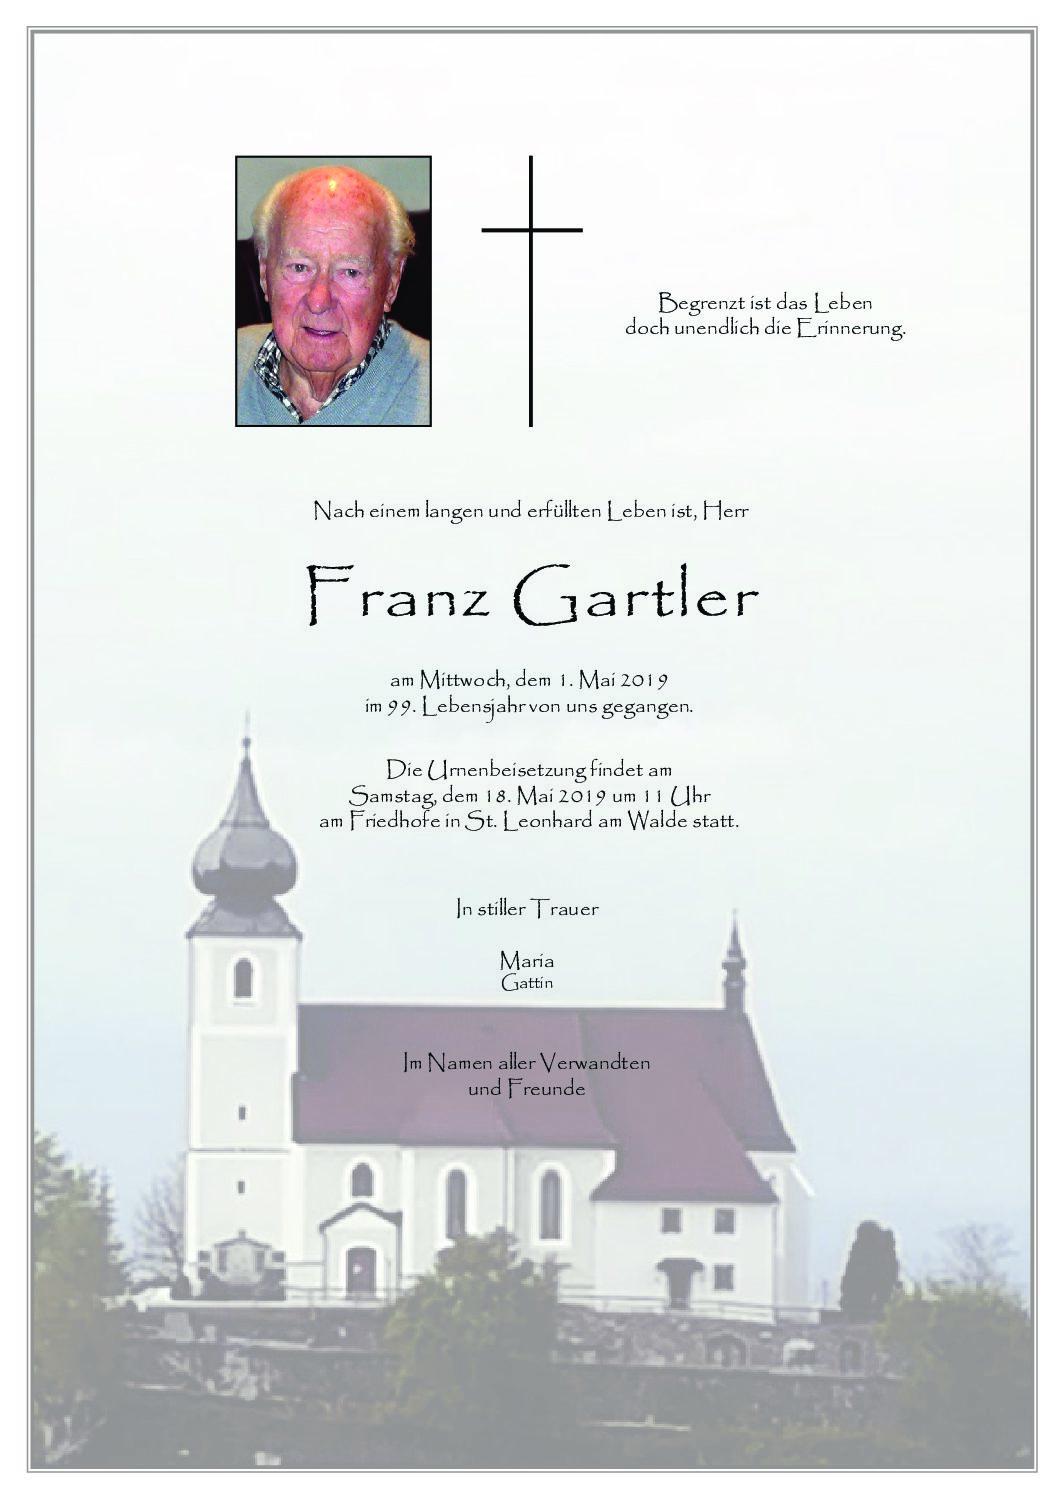 Franz Gartler